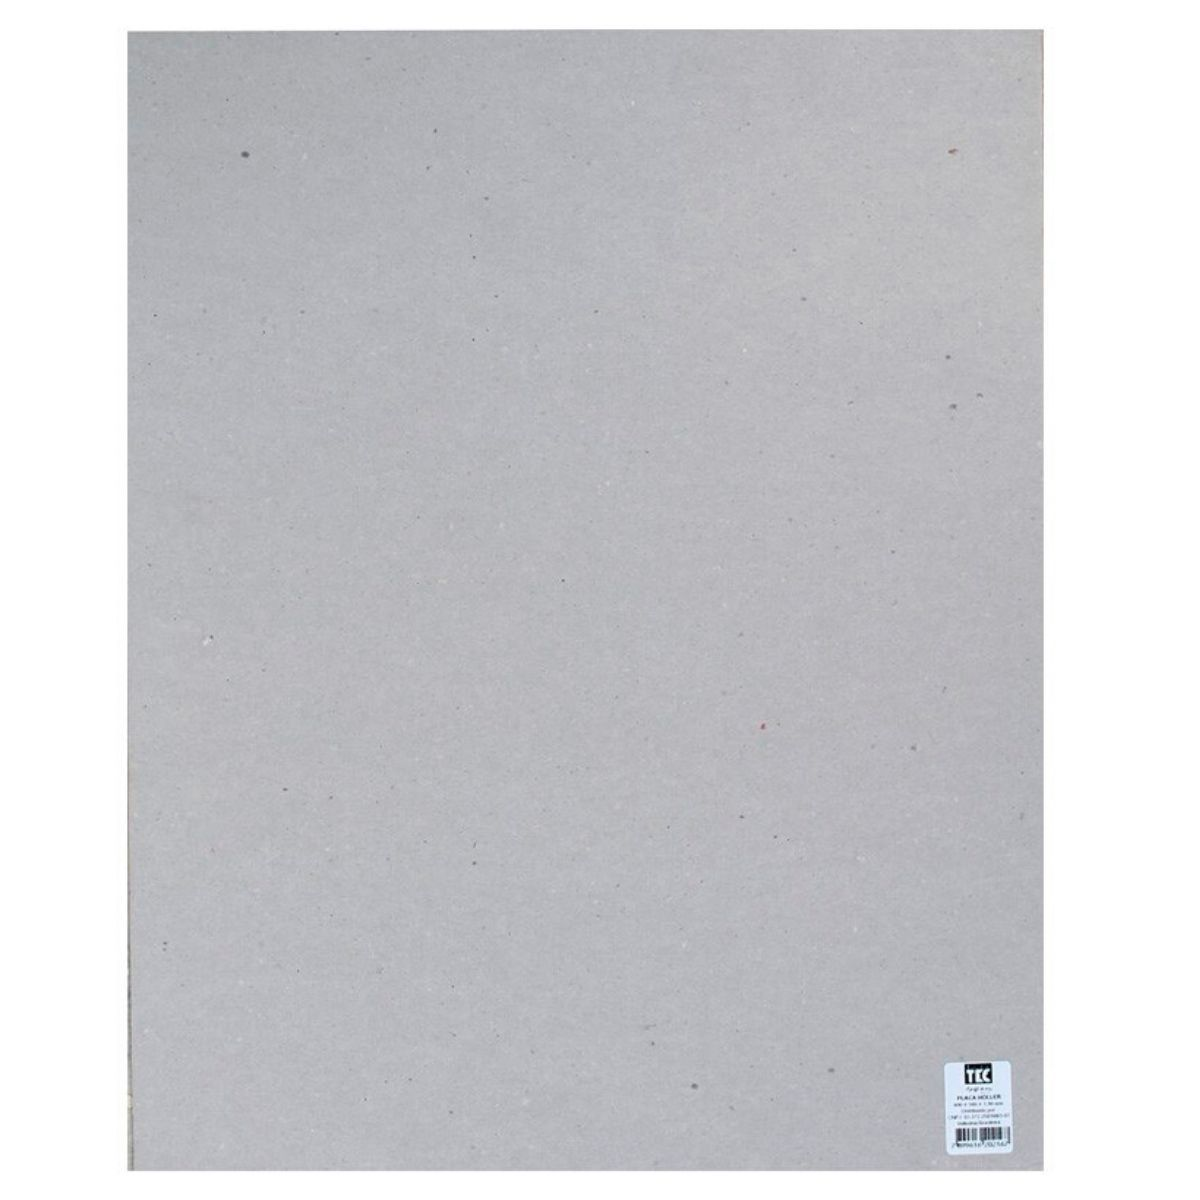 Papelão Cinza tipo Papel Holler 400 x 500 x 2,8mm Toke e Crie